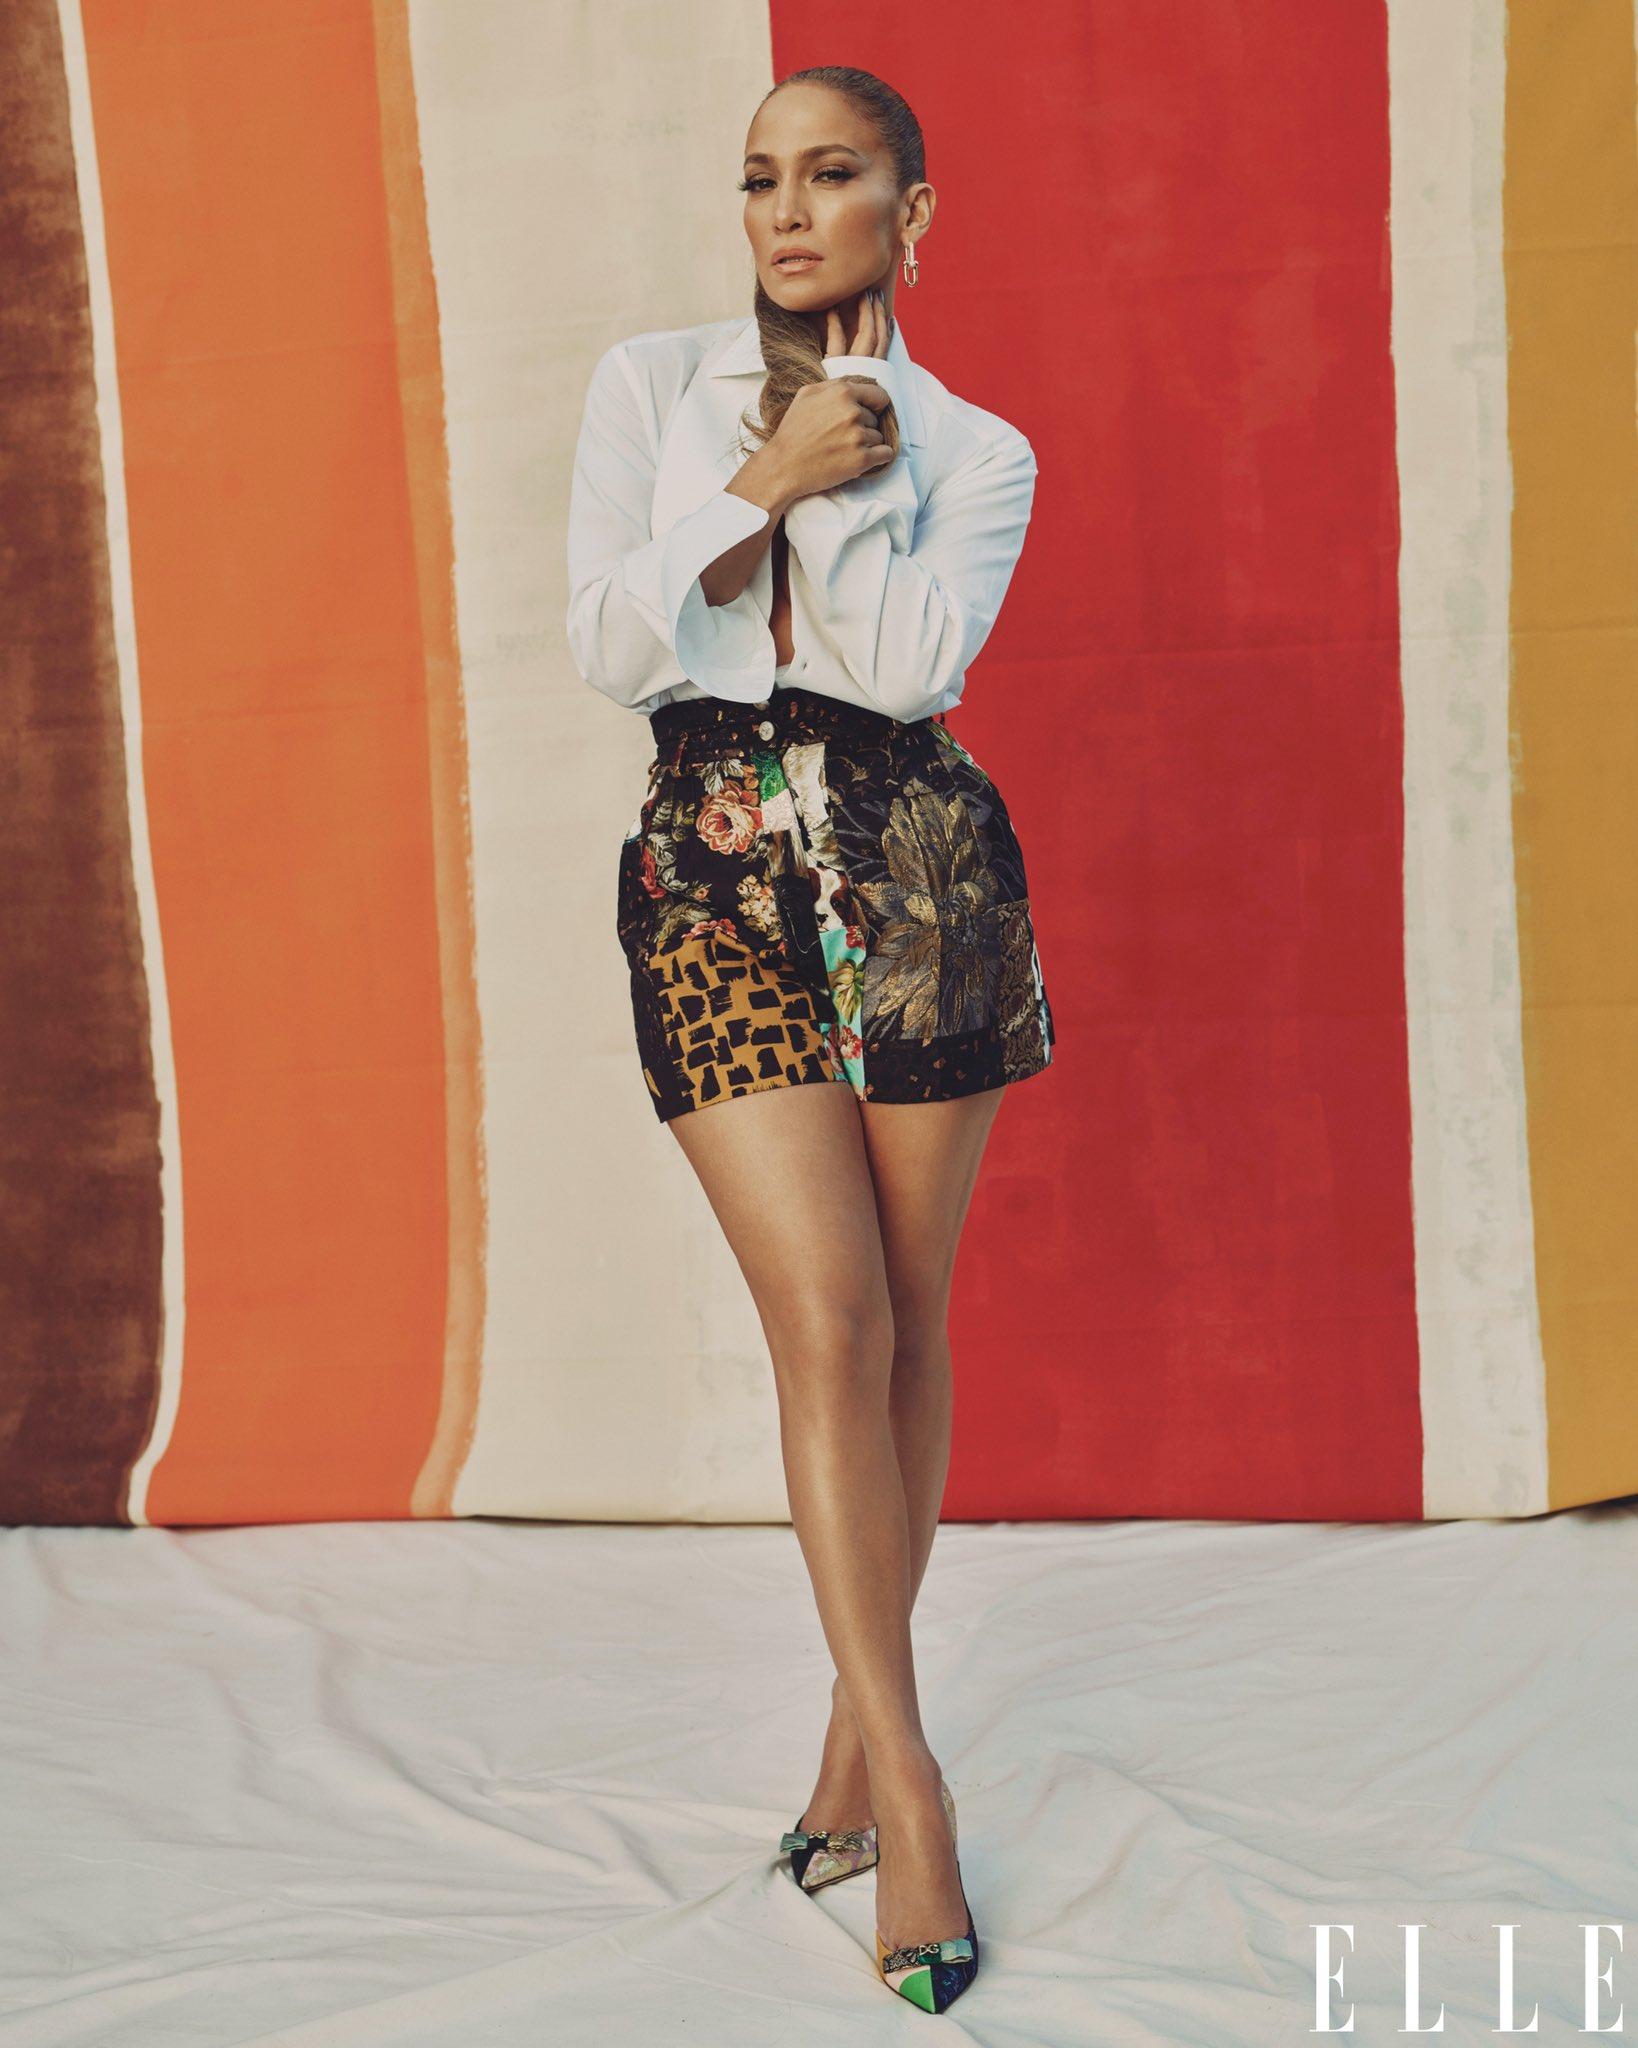 Jennifer Lopez - Σελίδα 5 Ers4kmPUYAg4QnS?format=jpg&name=large